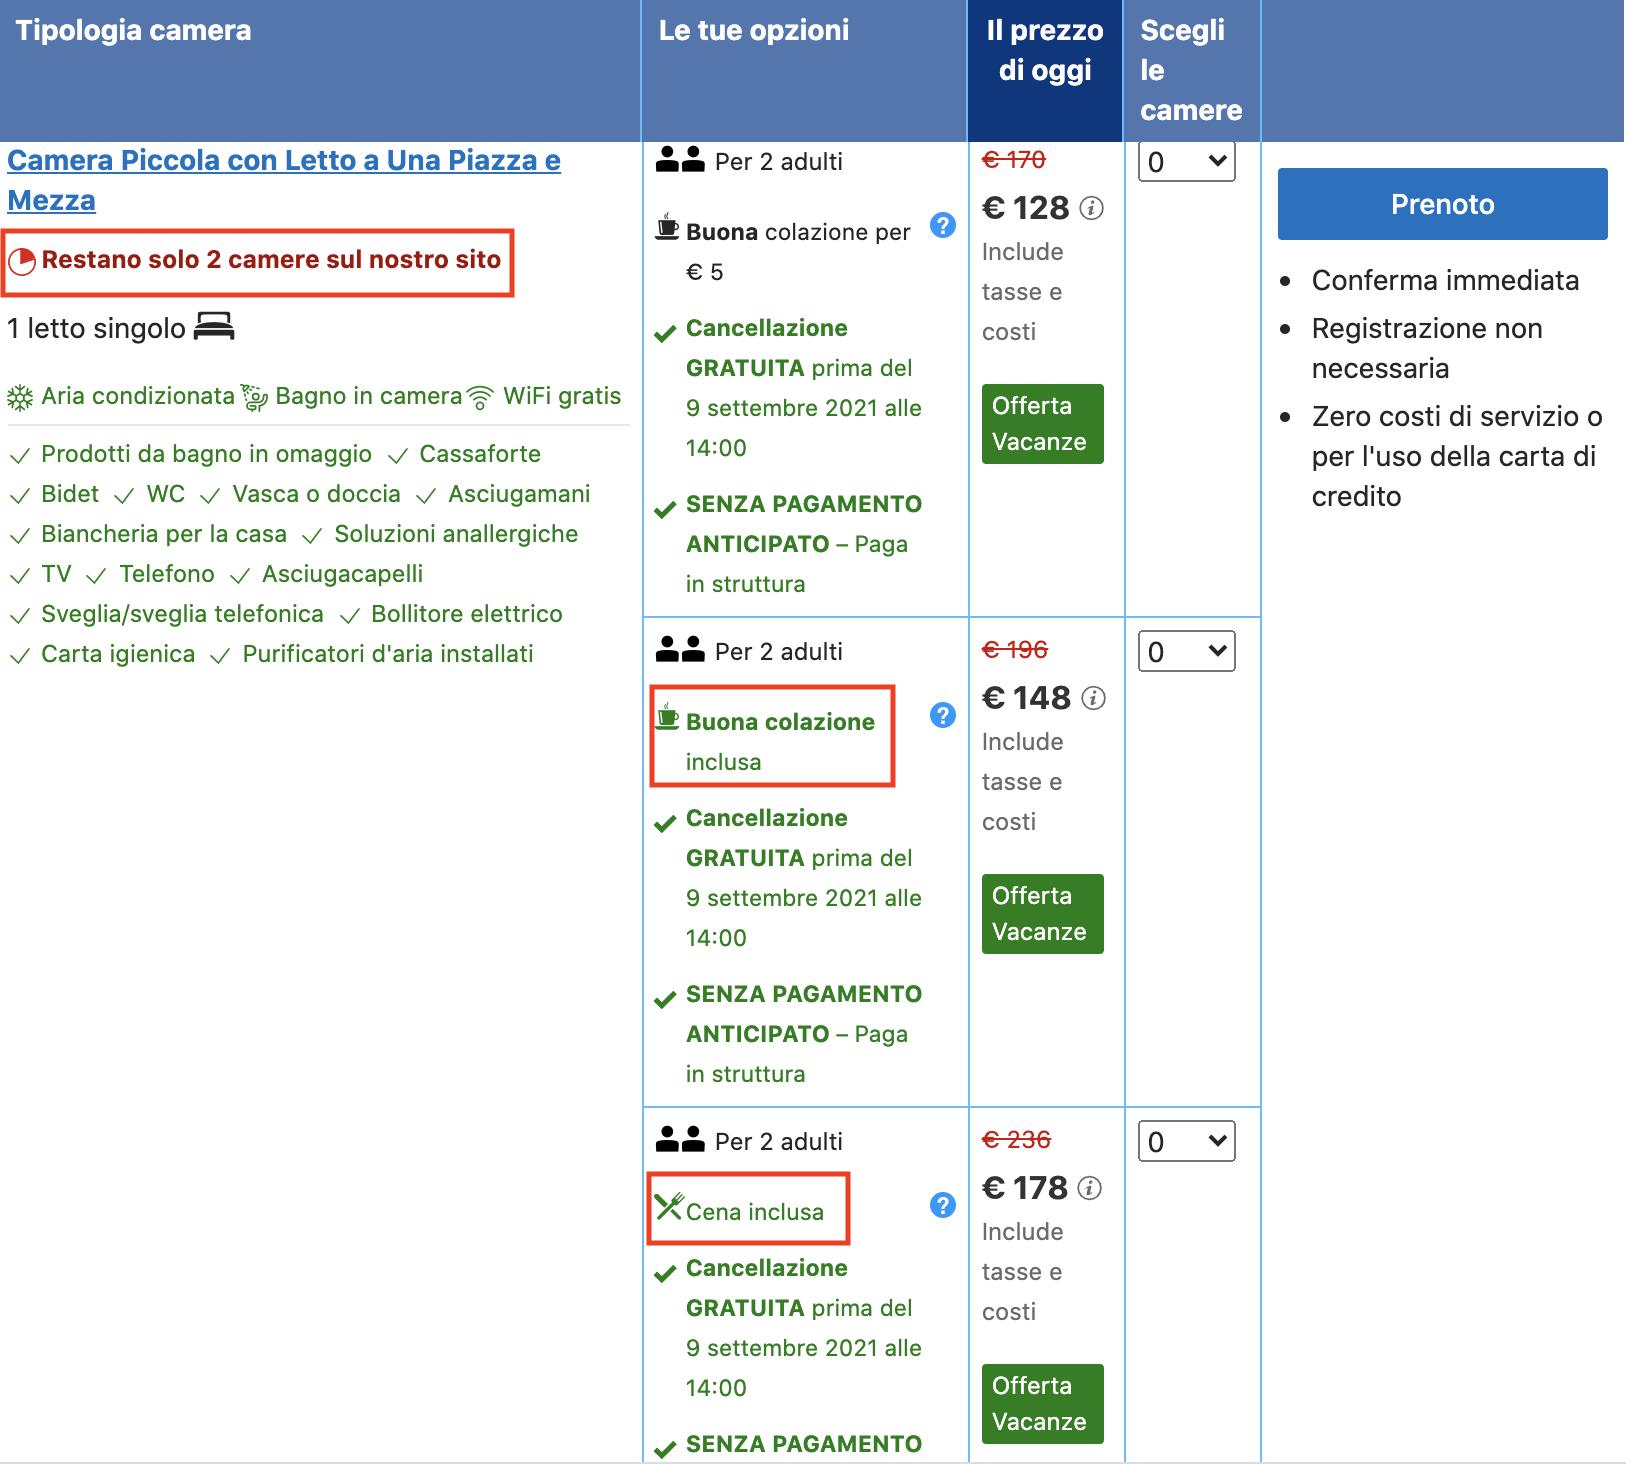 Booking: tecniche di cross-selling e up-selling on-site.